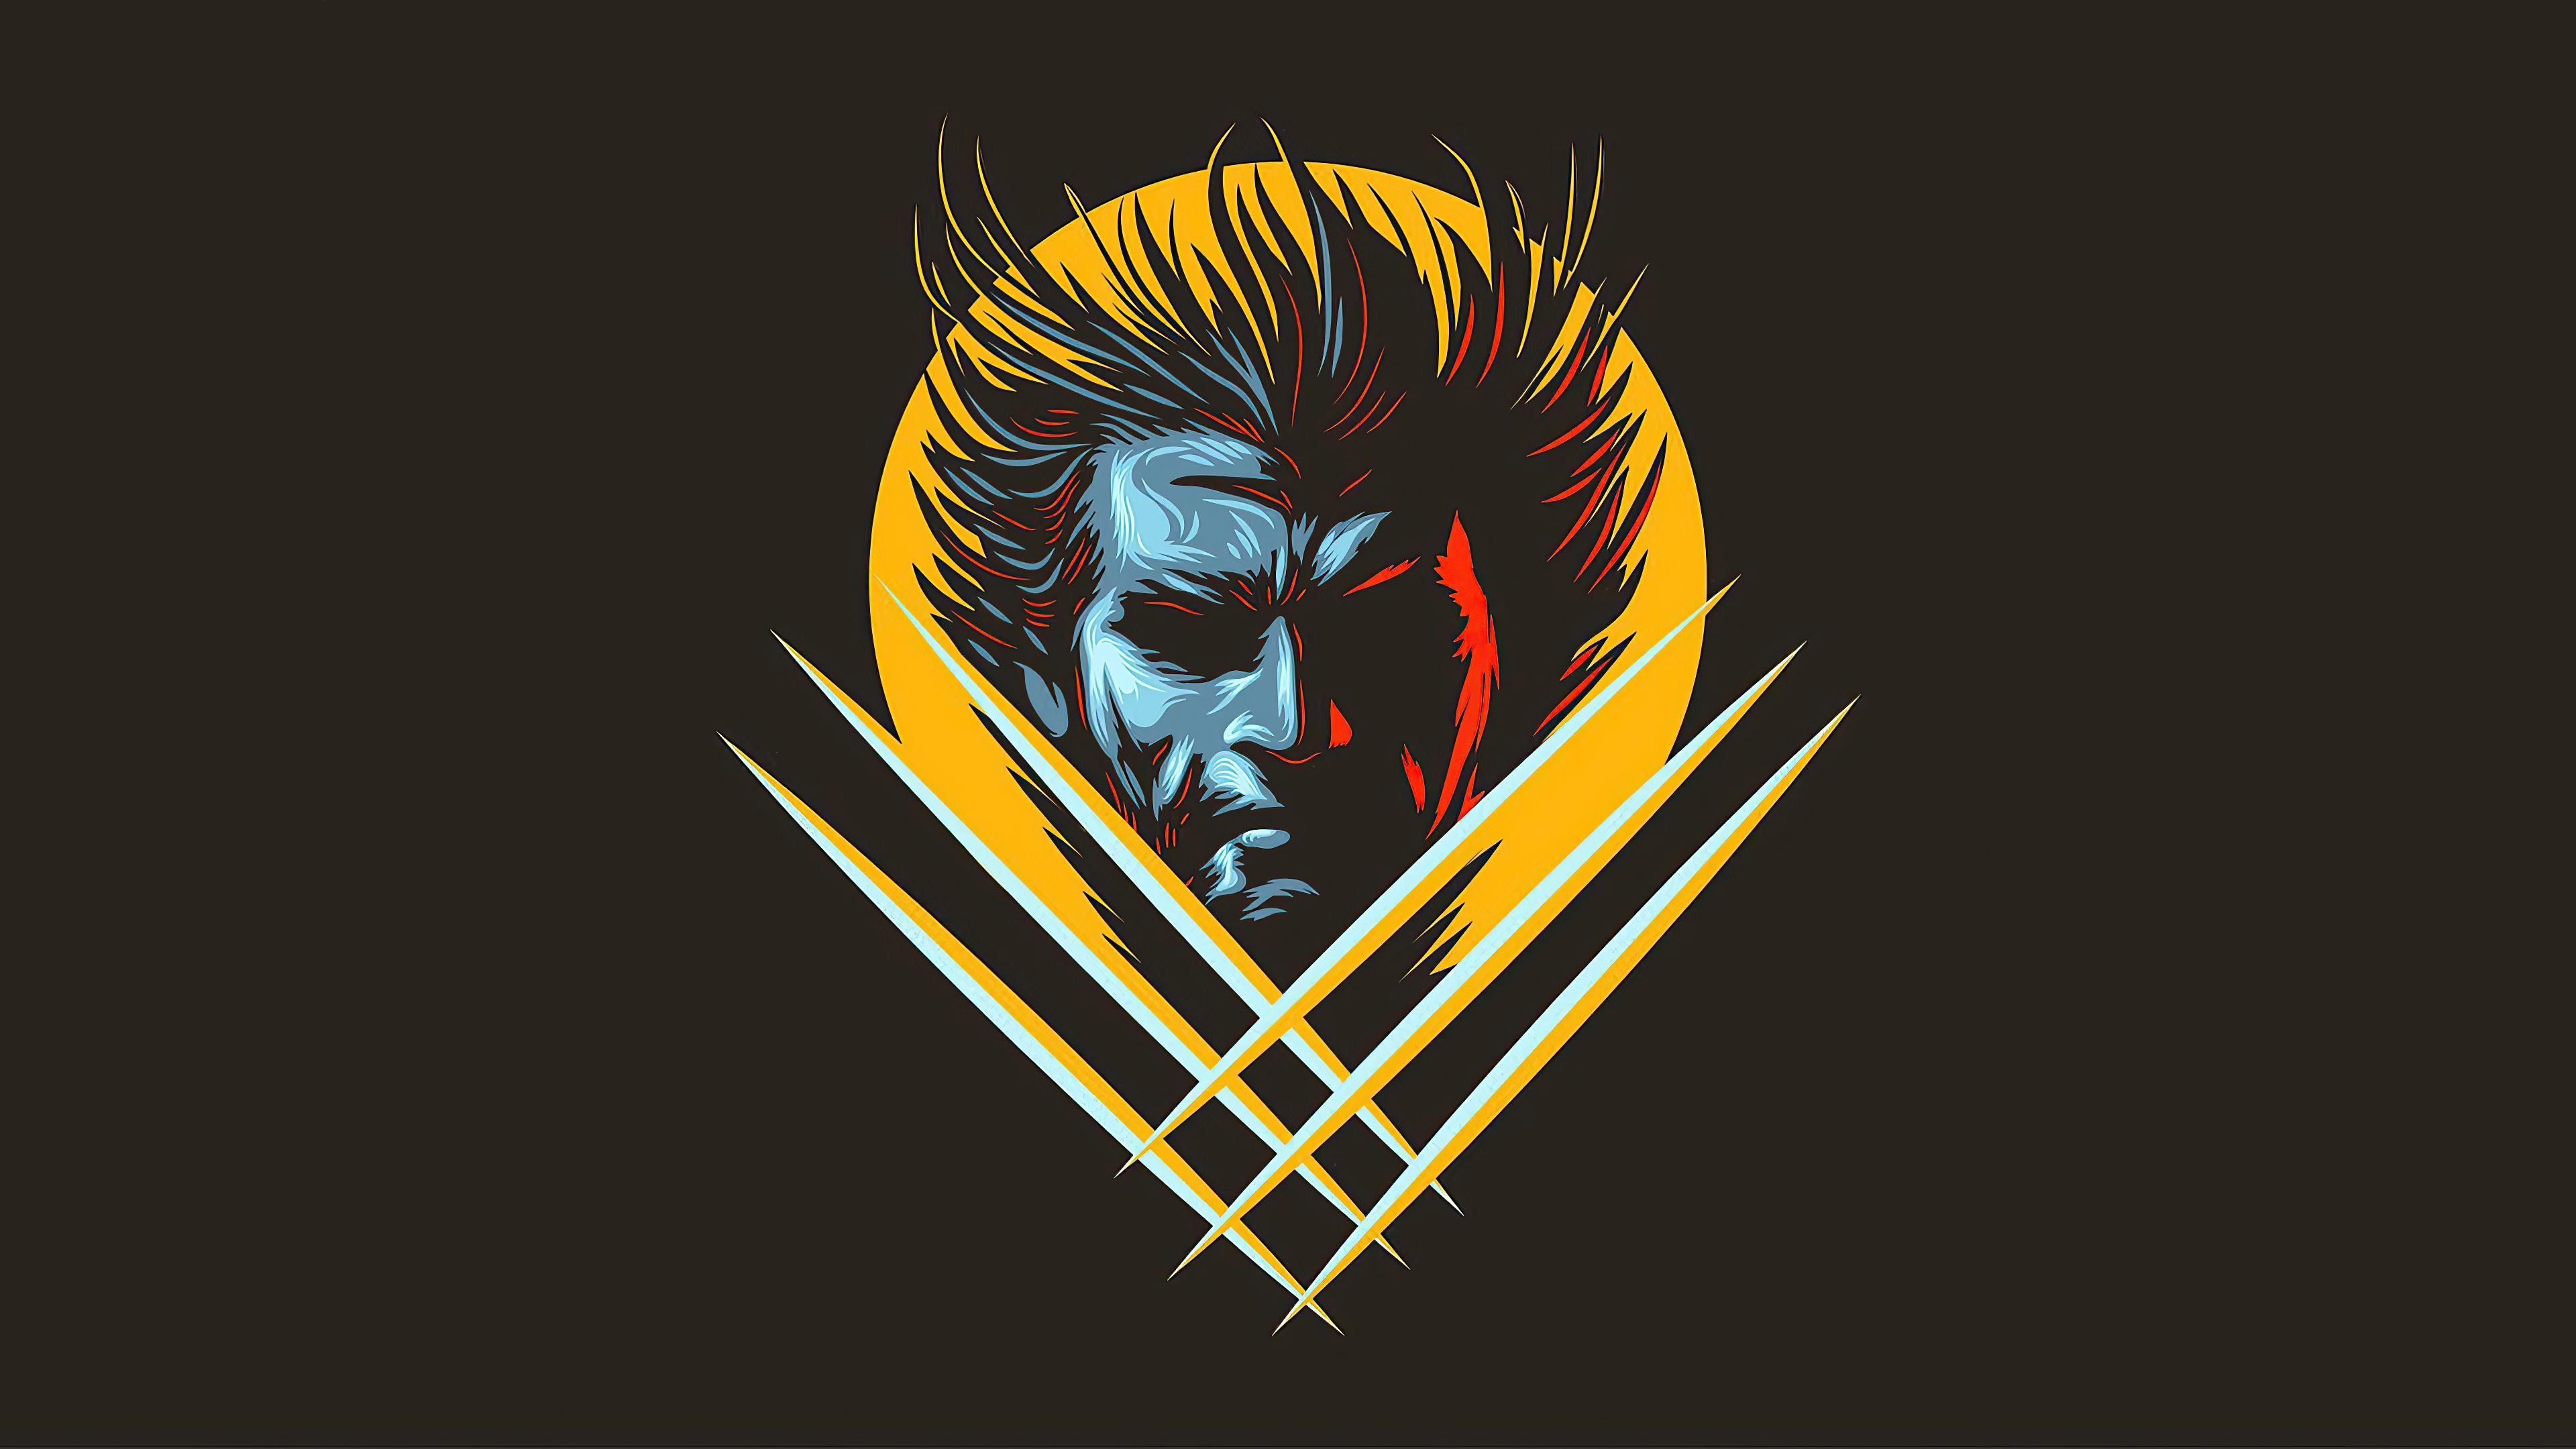 Wolverine Minimalist Style Wallpaper 4k Ultra HD ID:6231